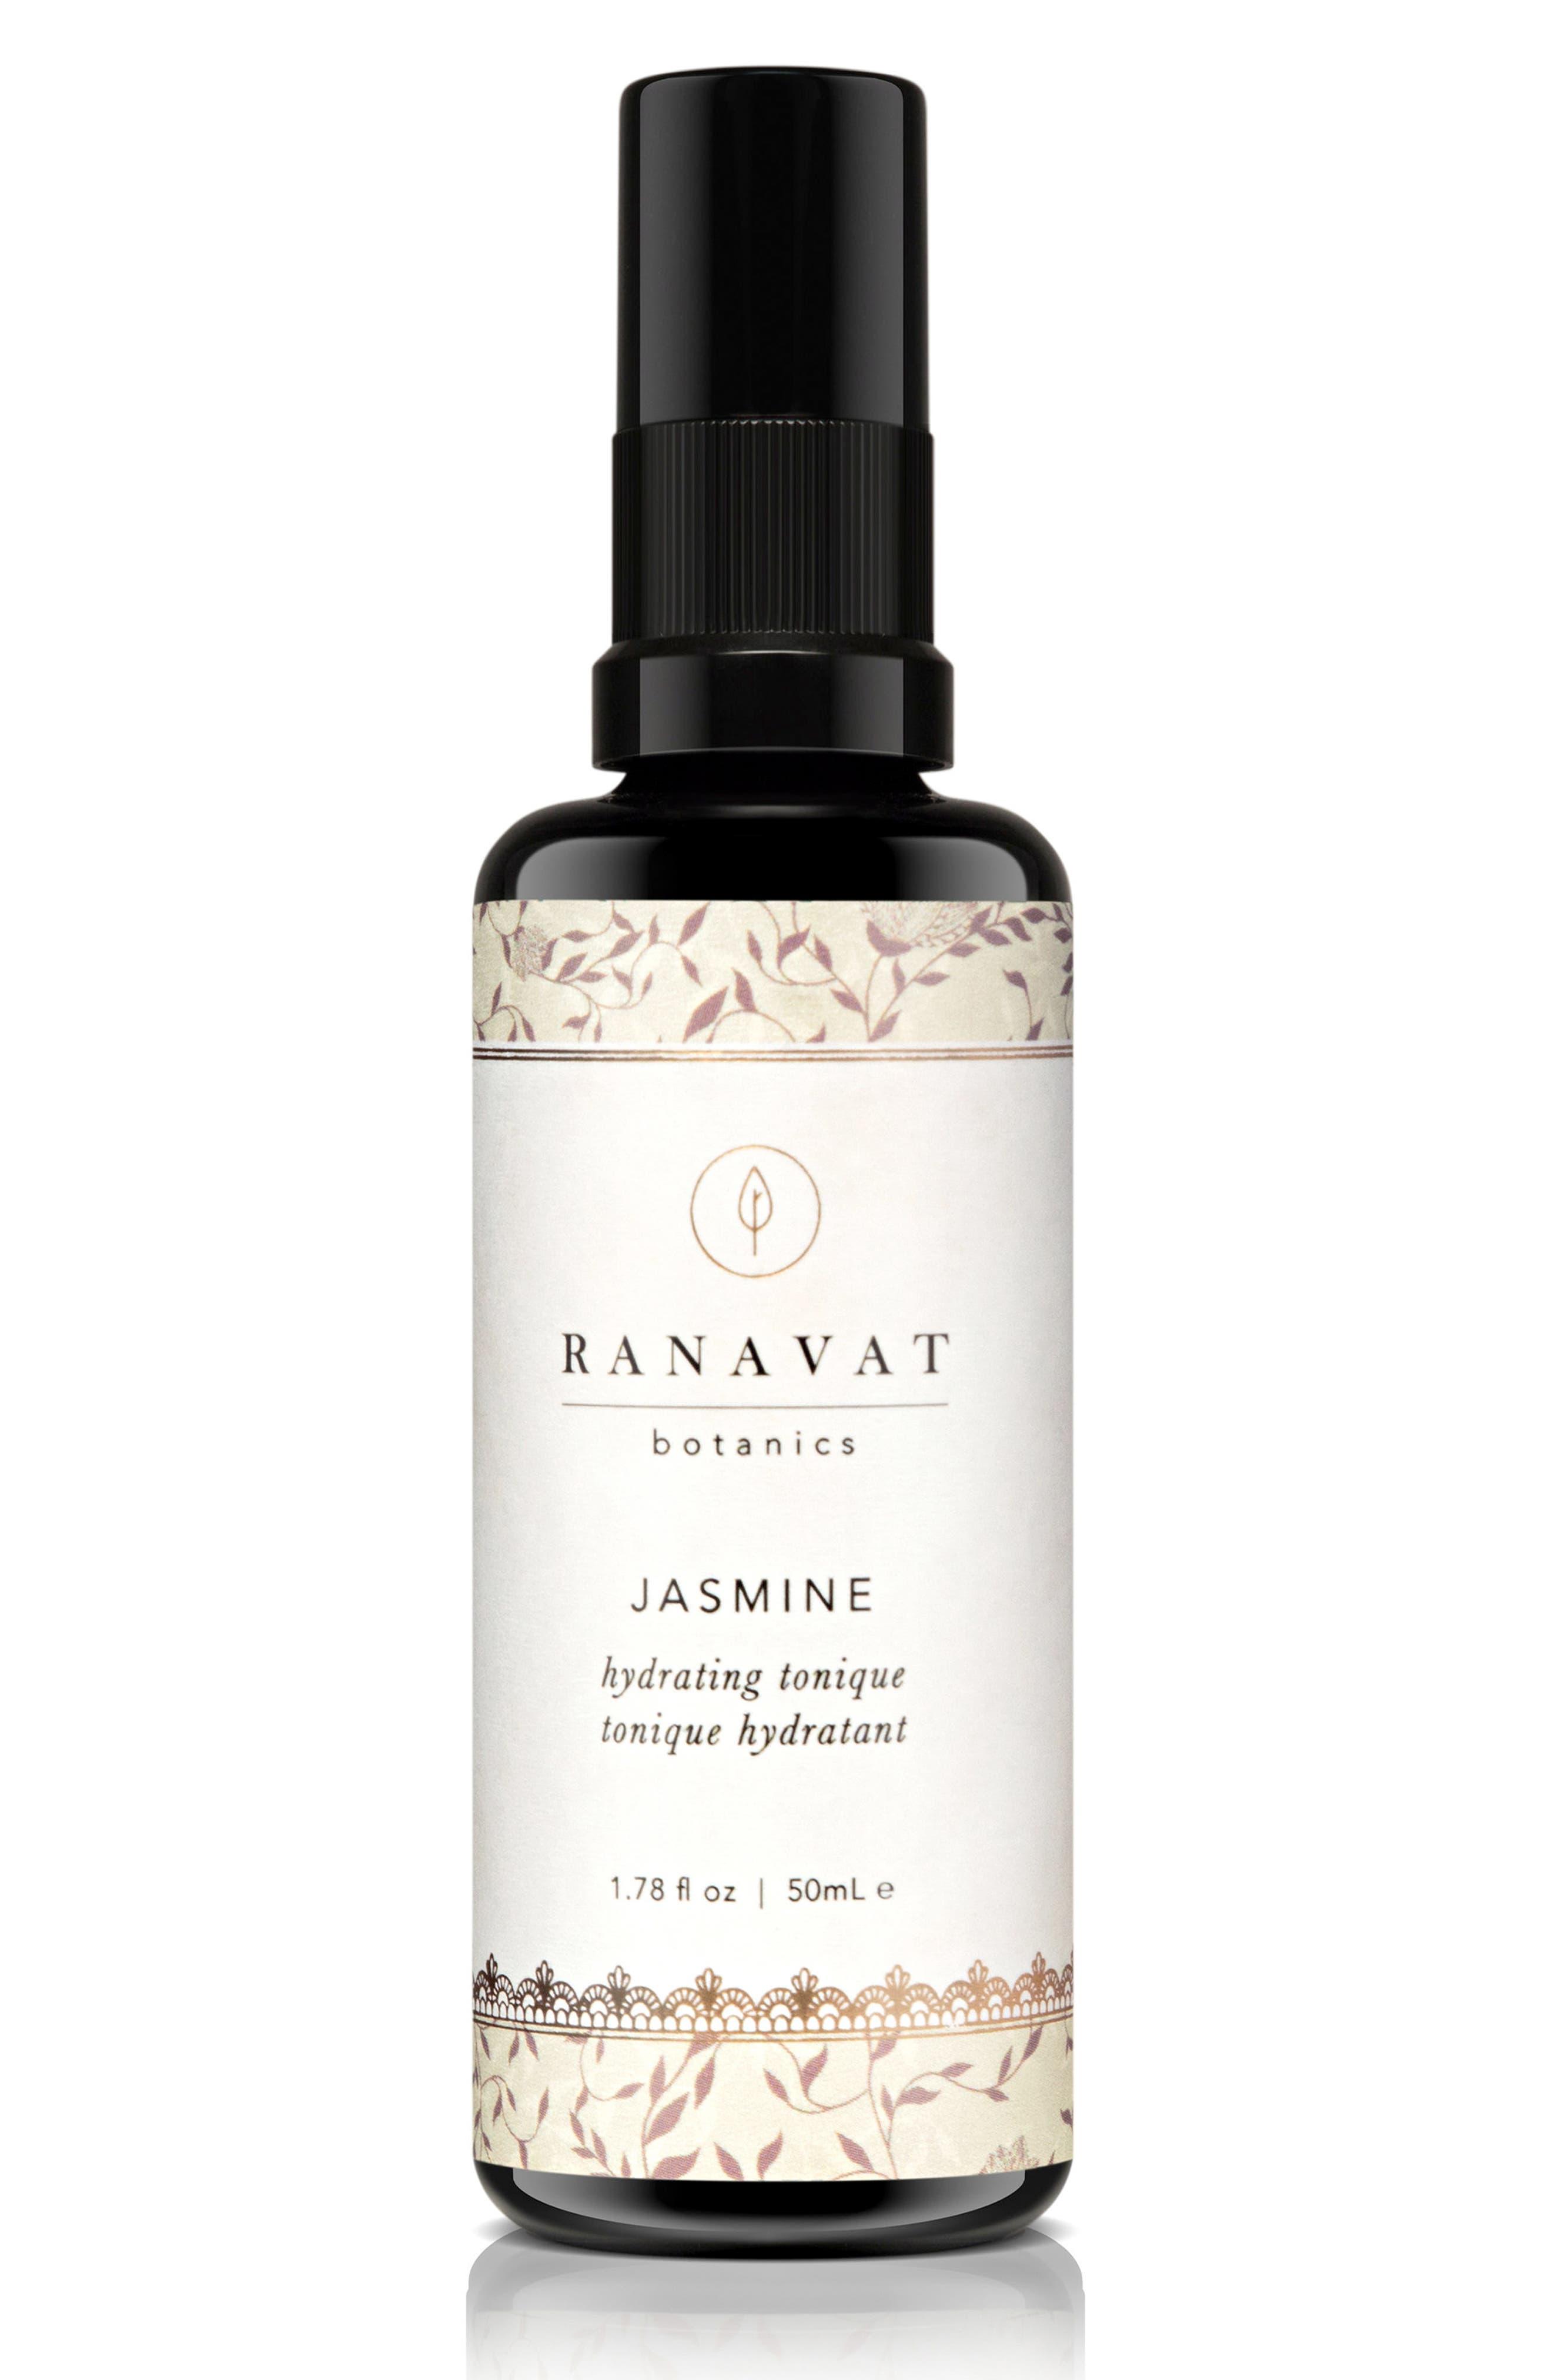 Ranavat Botanics Jasmine Hydrating Tonique